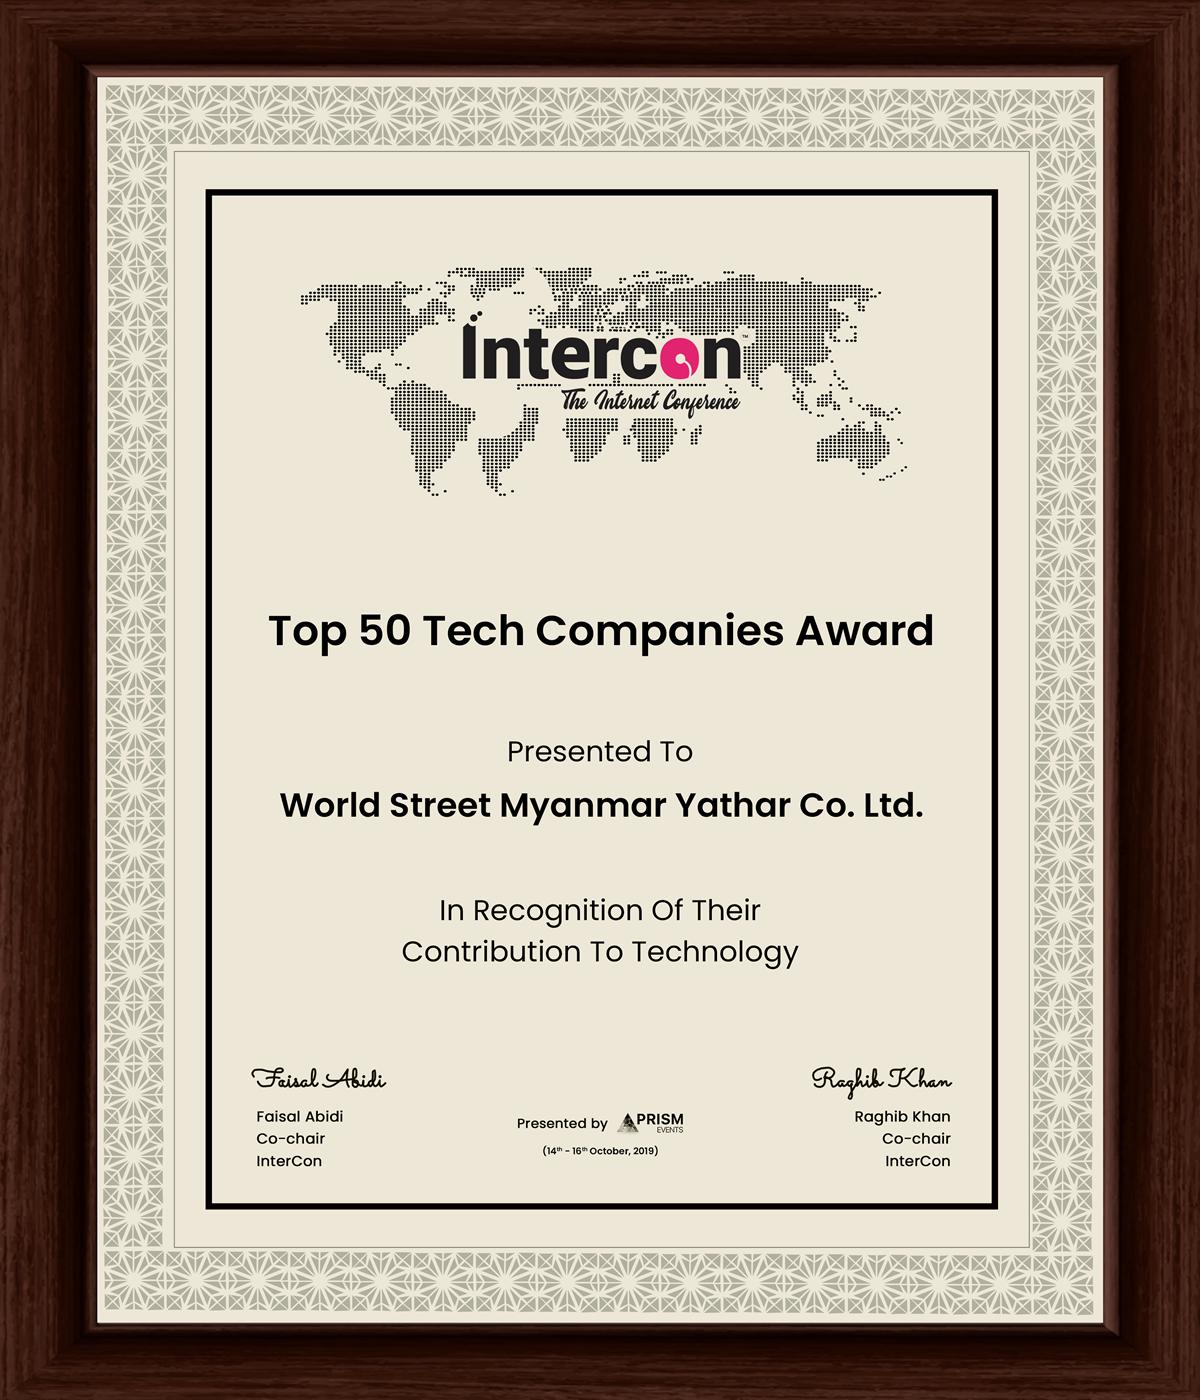 yathar wins Top 50 Tech Companies Award by InterCon